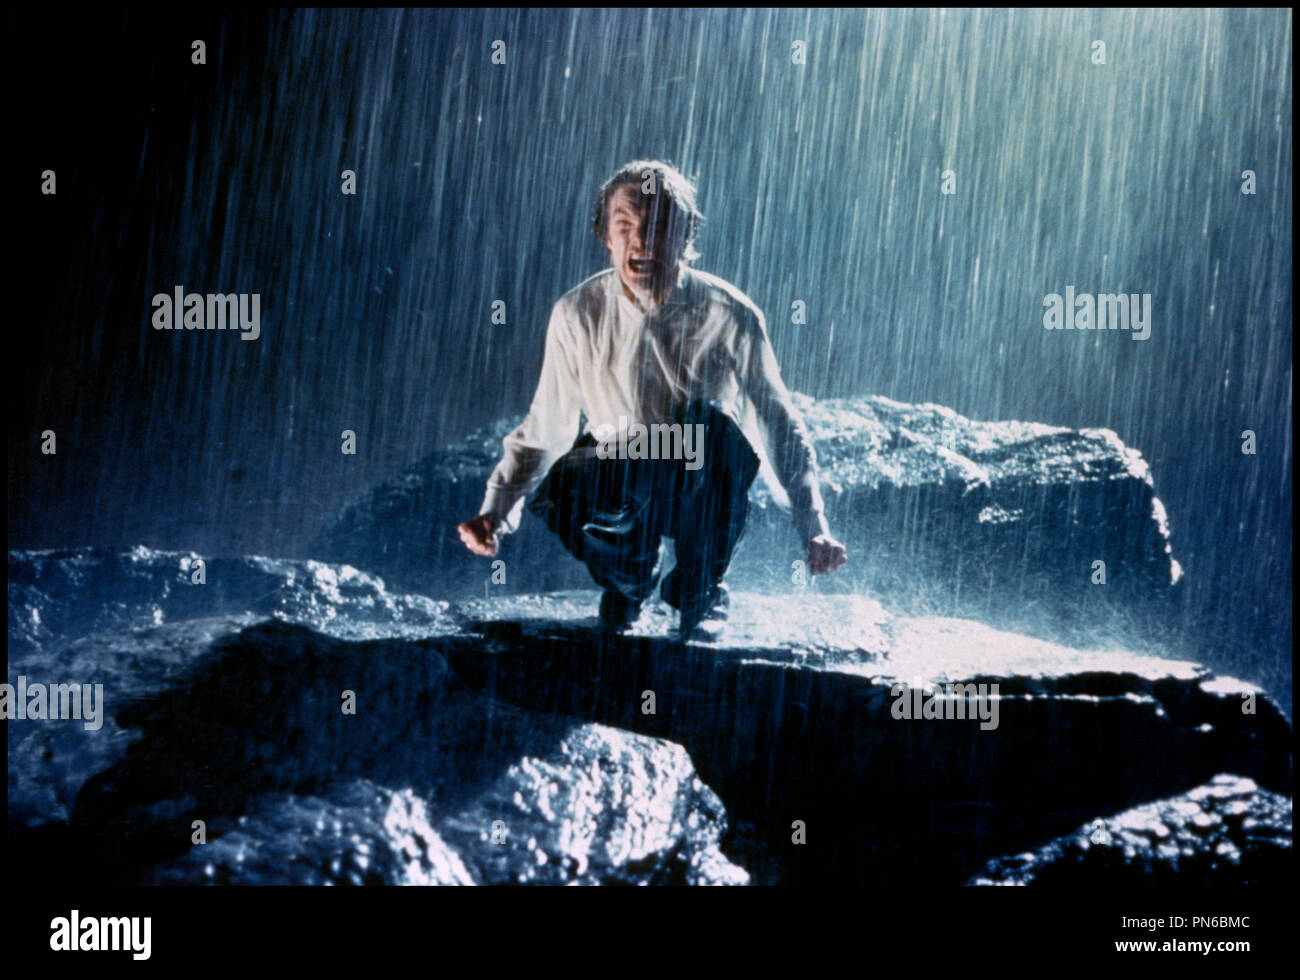 Prod DB © Working Title / DR EDWARD II (EDWARD II) de Derek Jarman 1991 GB avec Andrew Tiernan folie, fou, pluie d'après la pièce de Christopher Marlowe - Stock Image